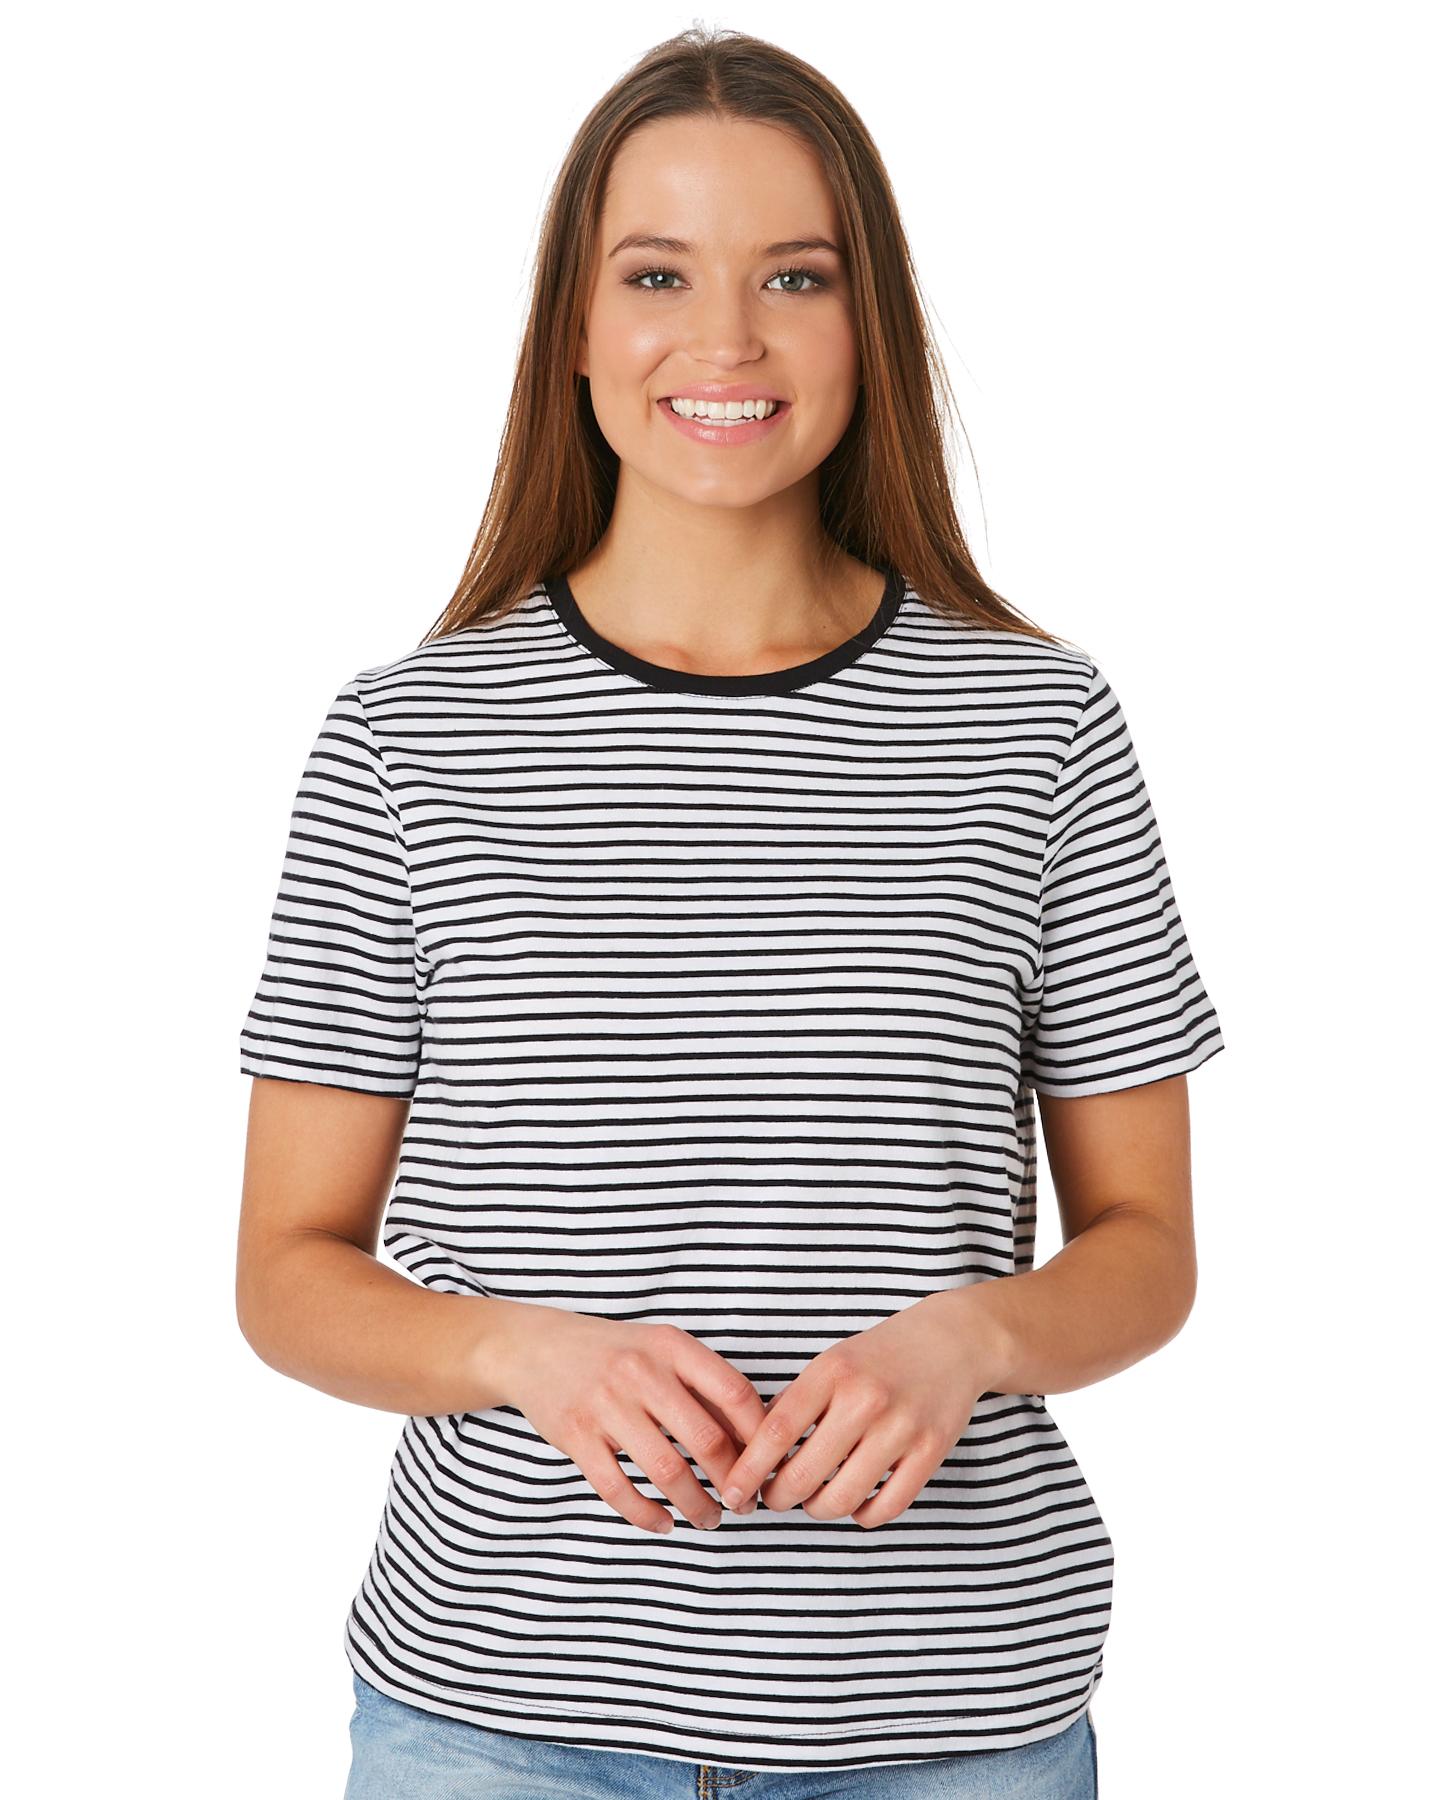 New-Swell-Women-039-s-Jesse-Stripe-Tee-Crew-Neck-Short-Sleeve-Cotton thumbnail 7